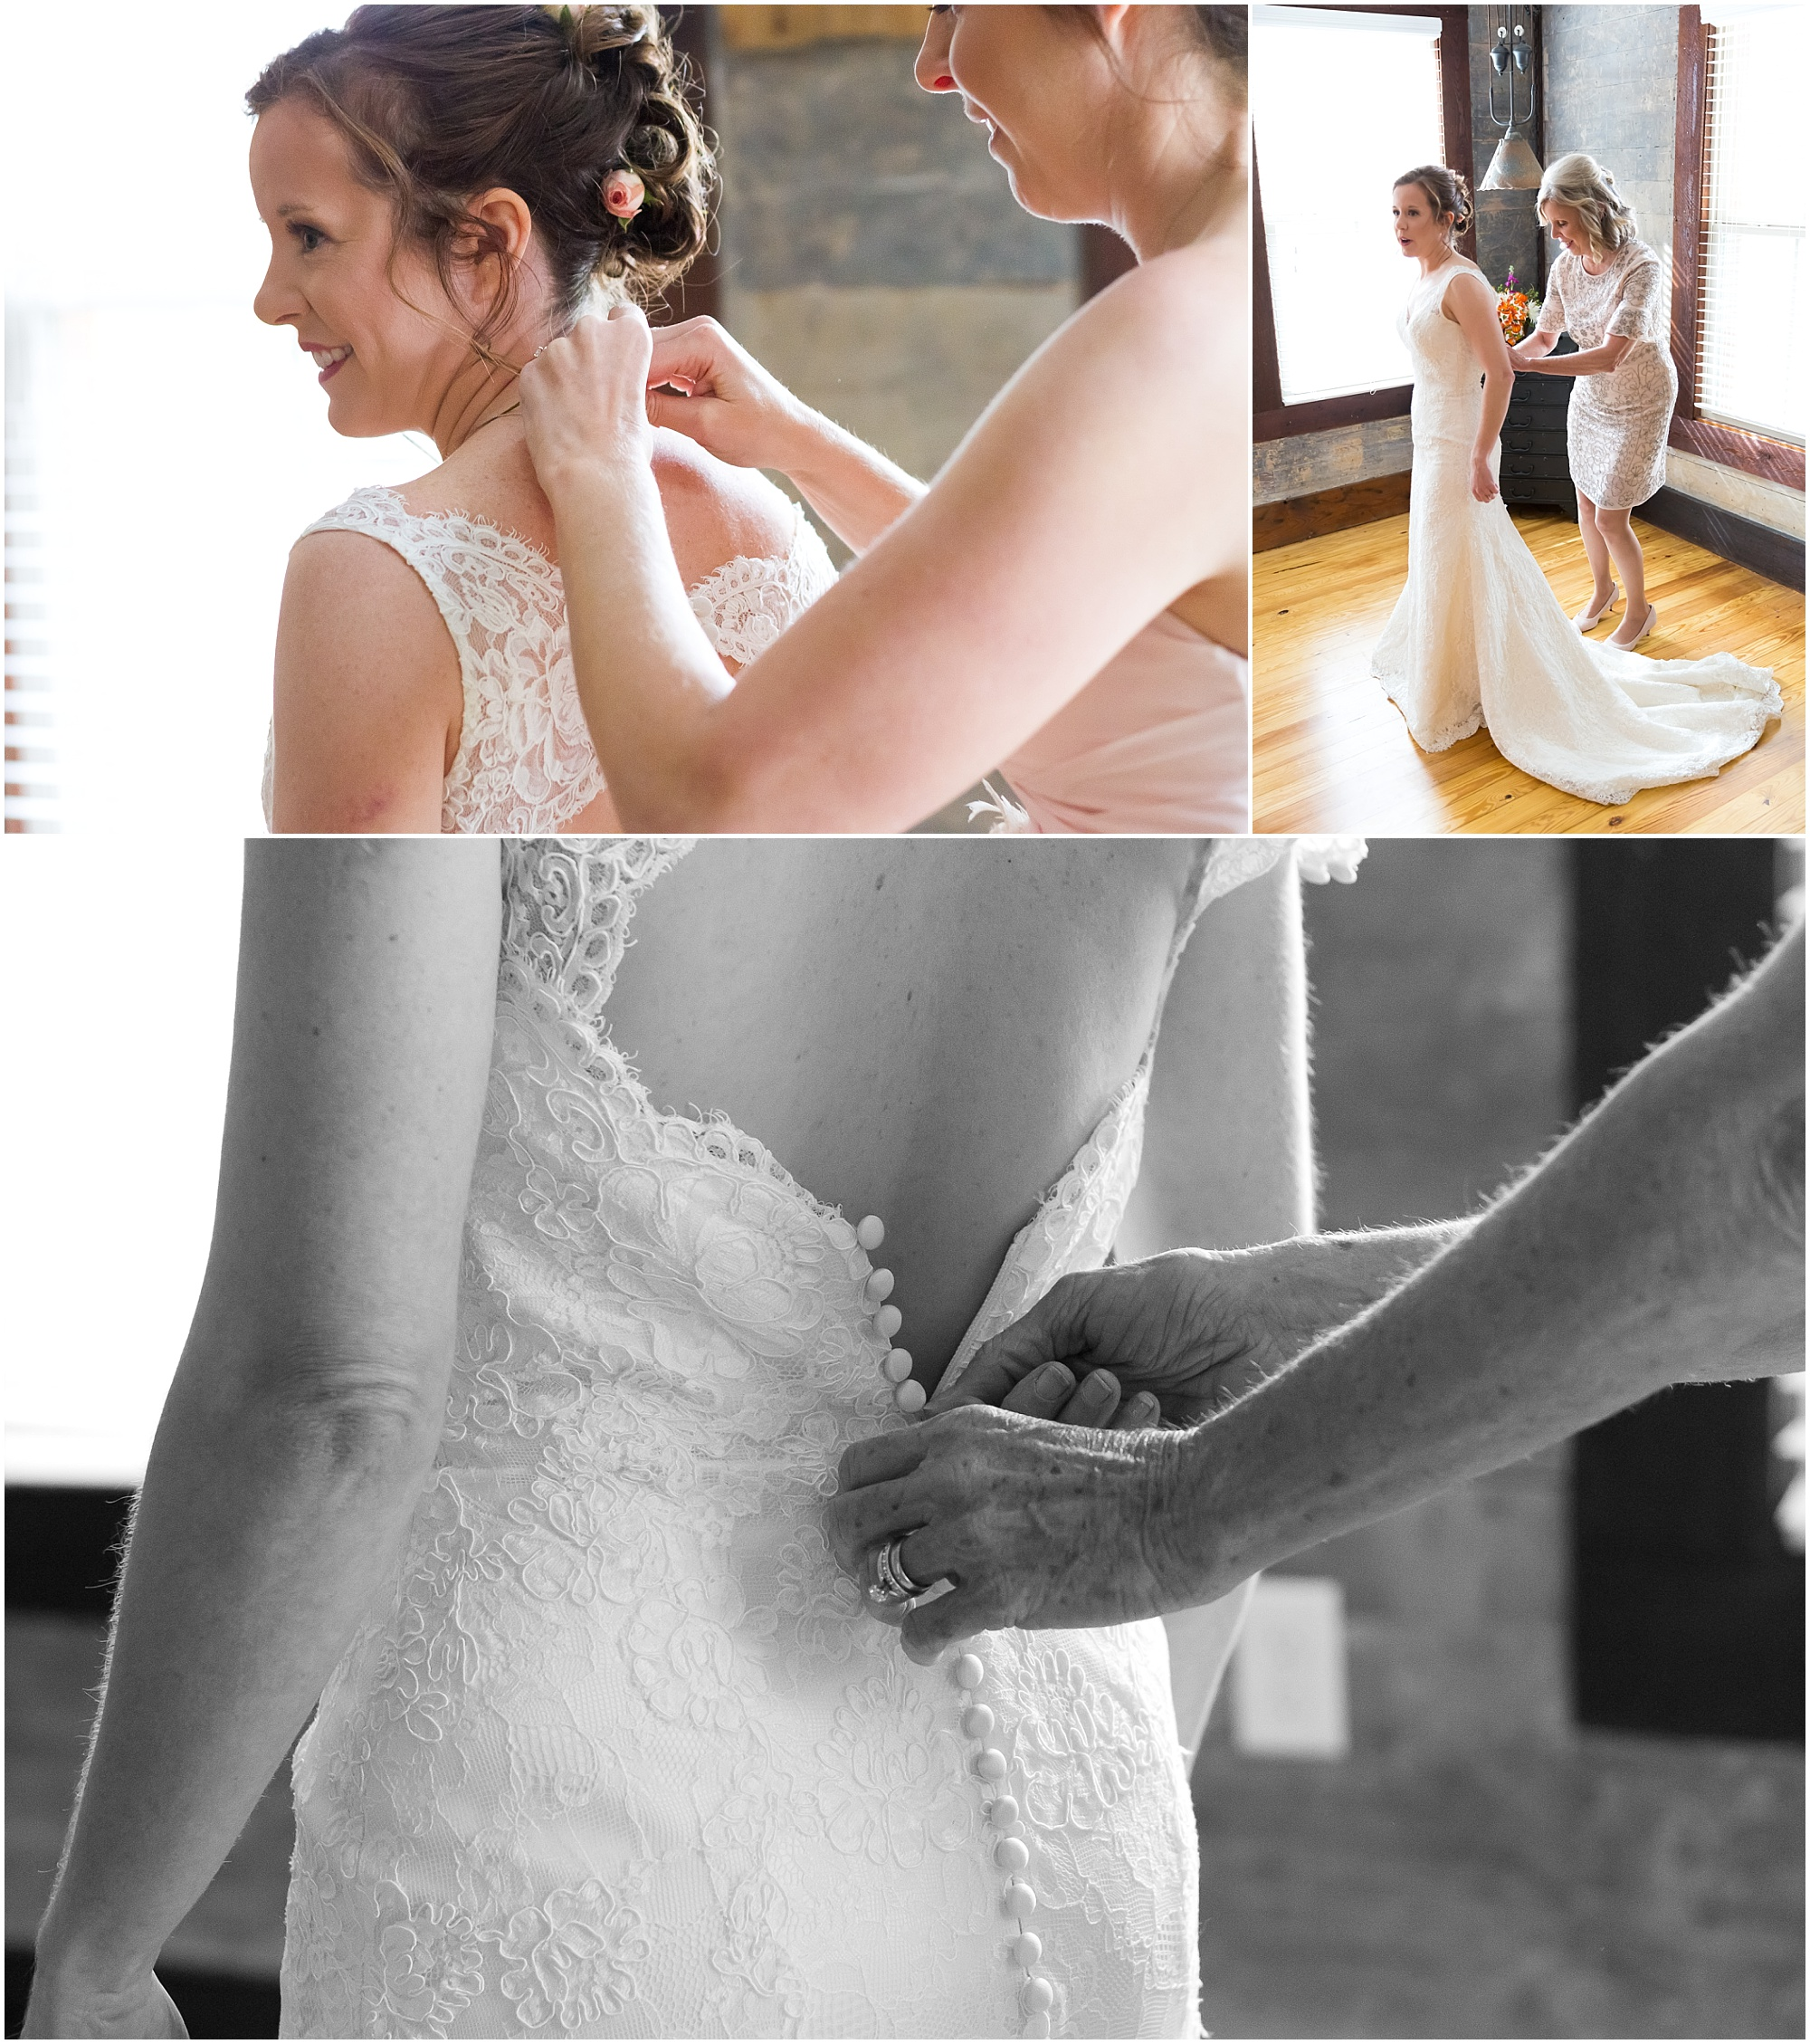 Bride getting into dress for her downtown Waco Texas wedding - Jason & Melaina Photography - www.jasonandmelaina.com